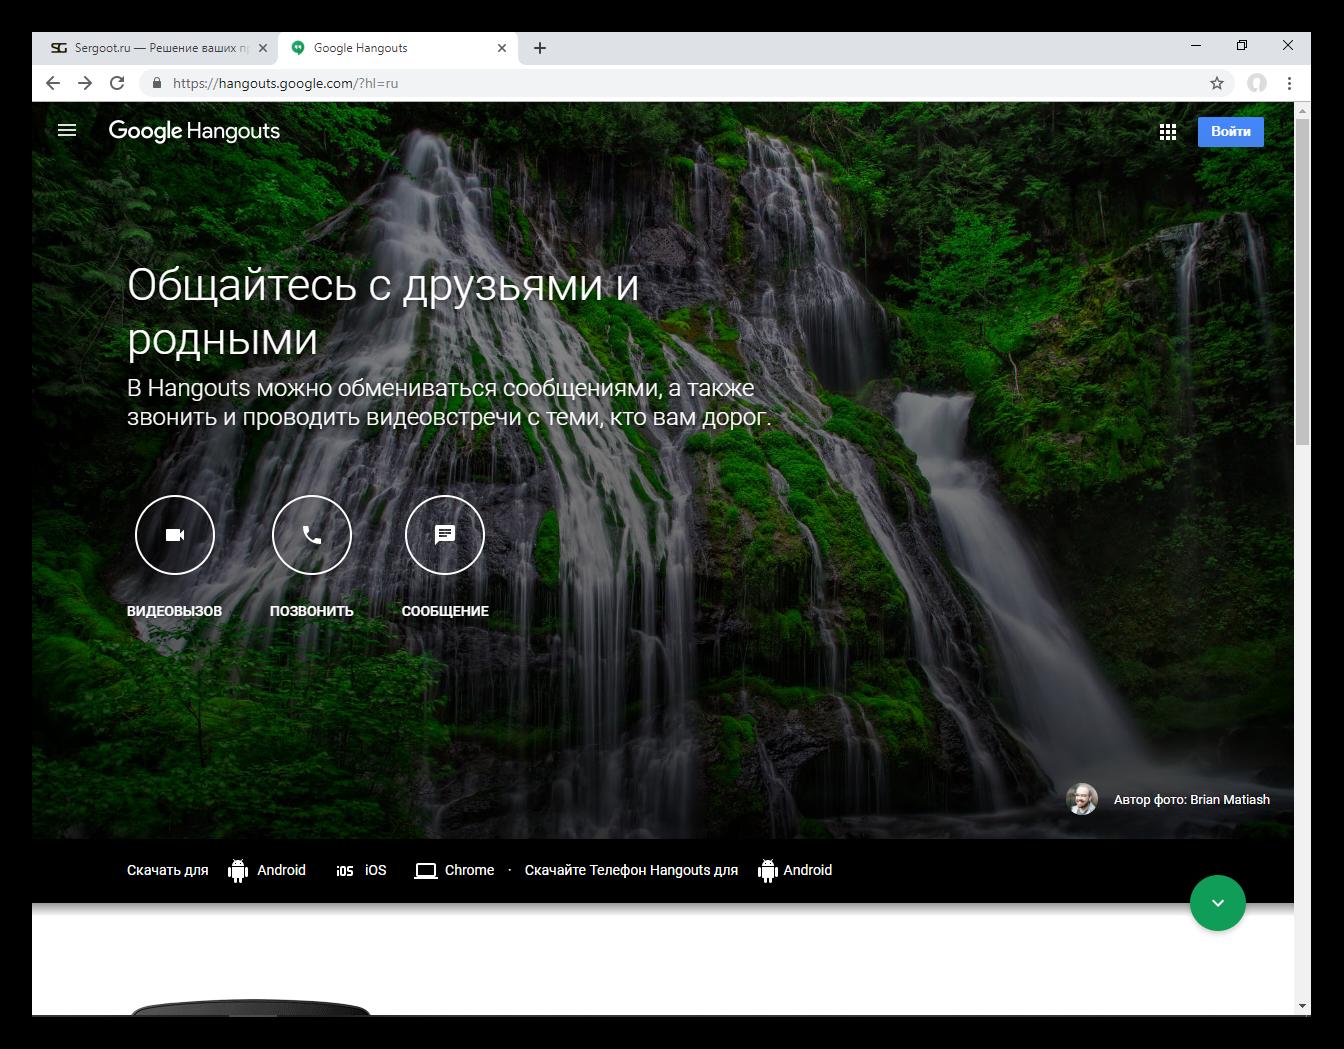 Главная страница онлайн-версии Hangouts